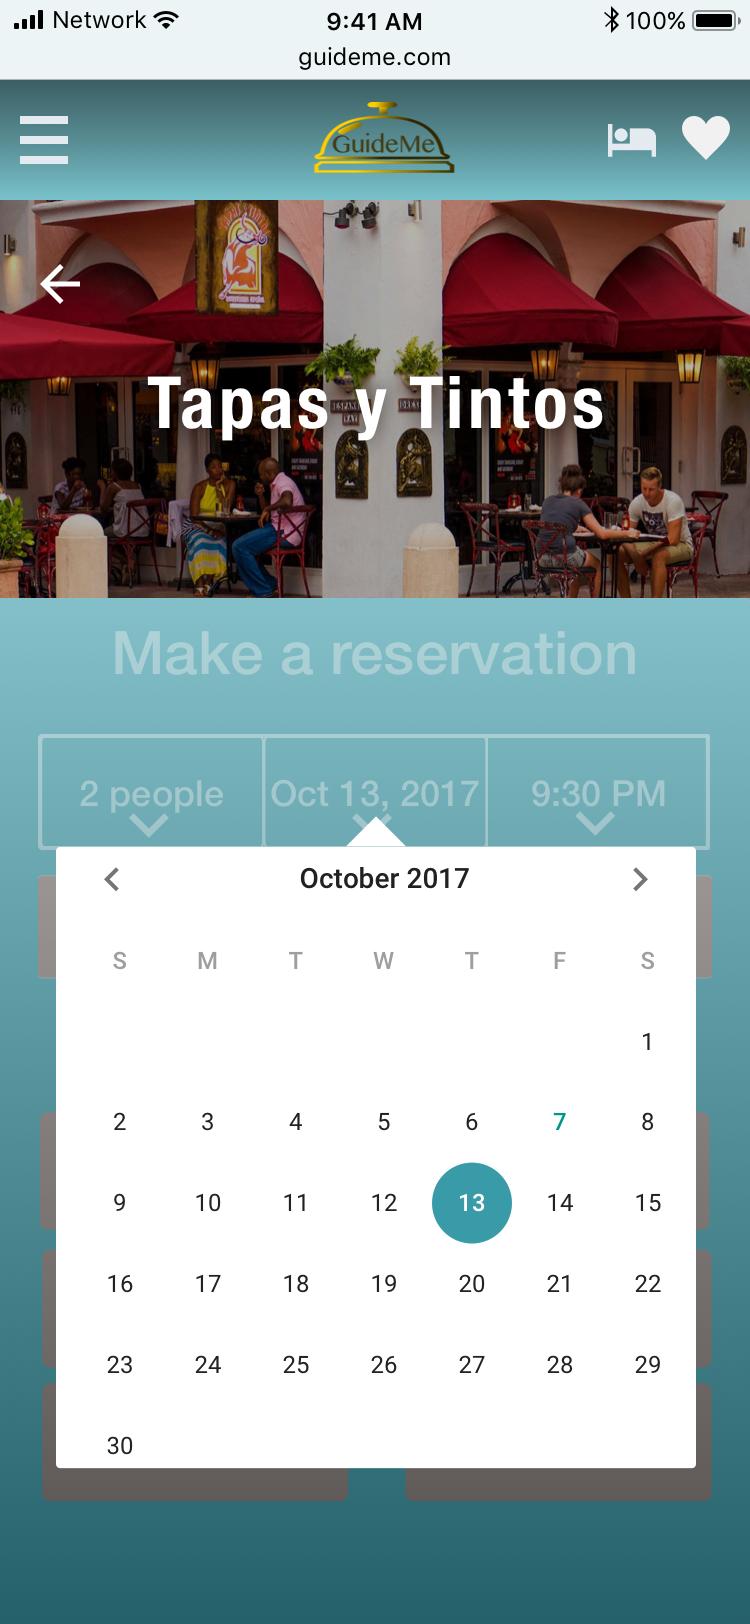 Restaurant reservation-date